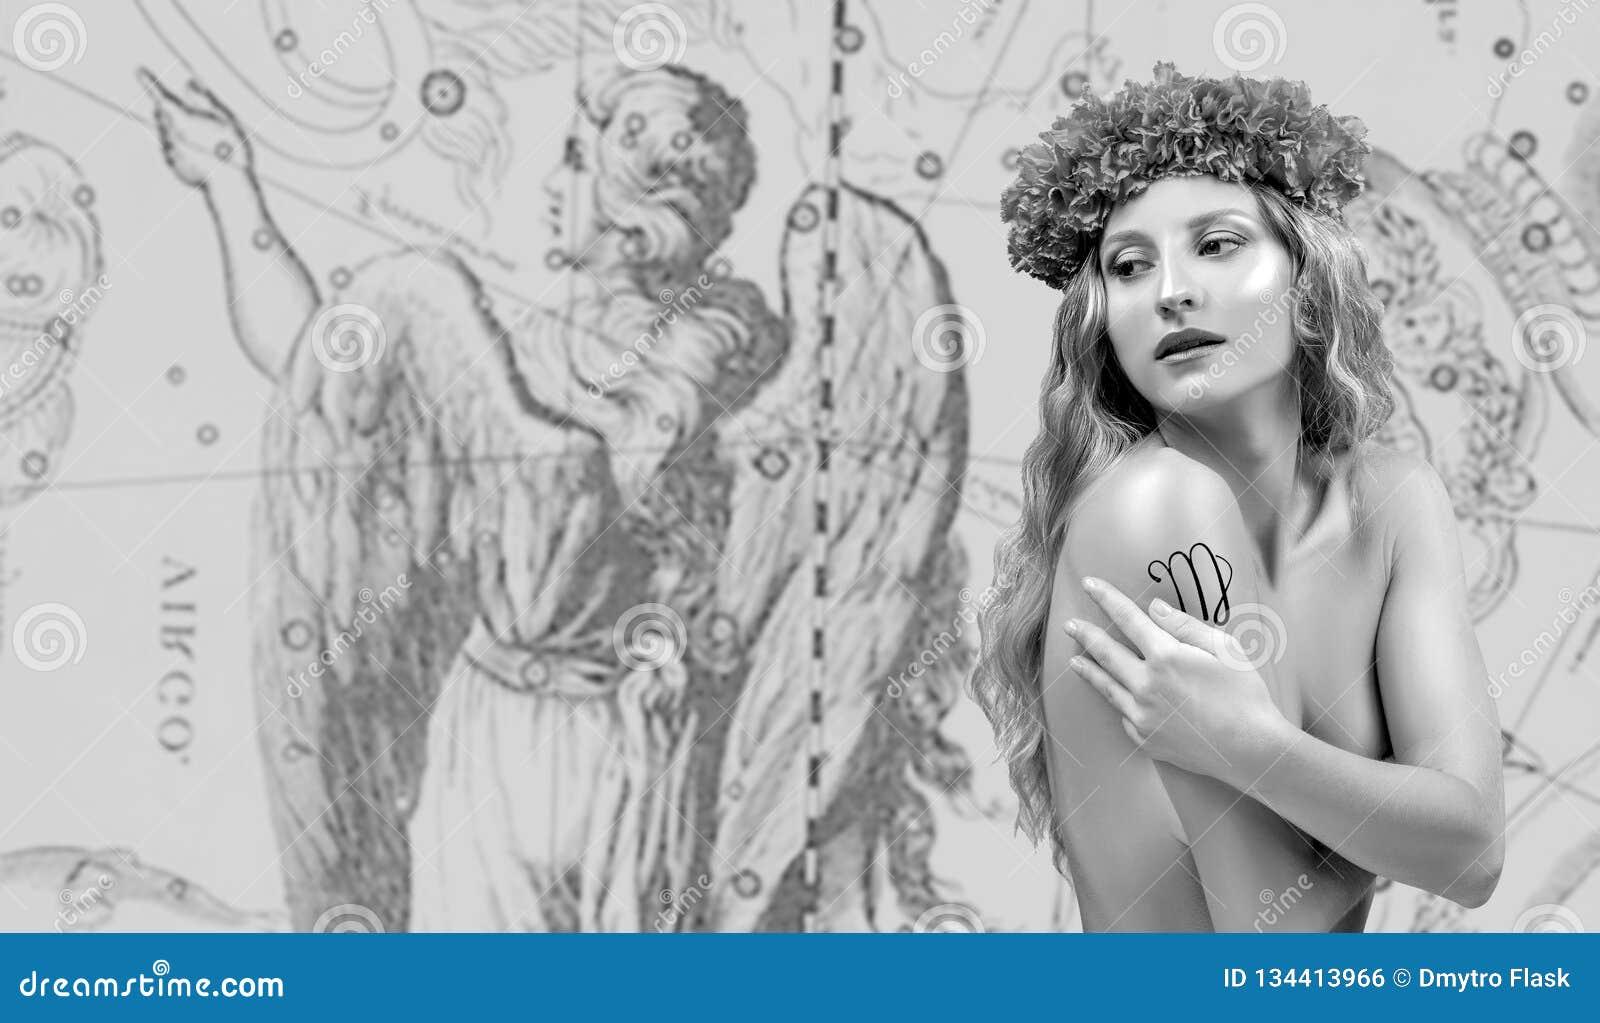 Horoscope. Virgo Zodiac Sign, Beautiful woman Virgo on zodiac map